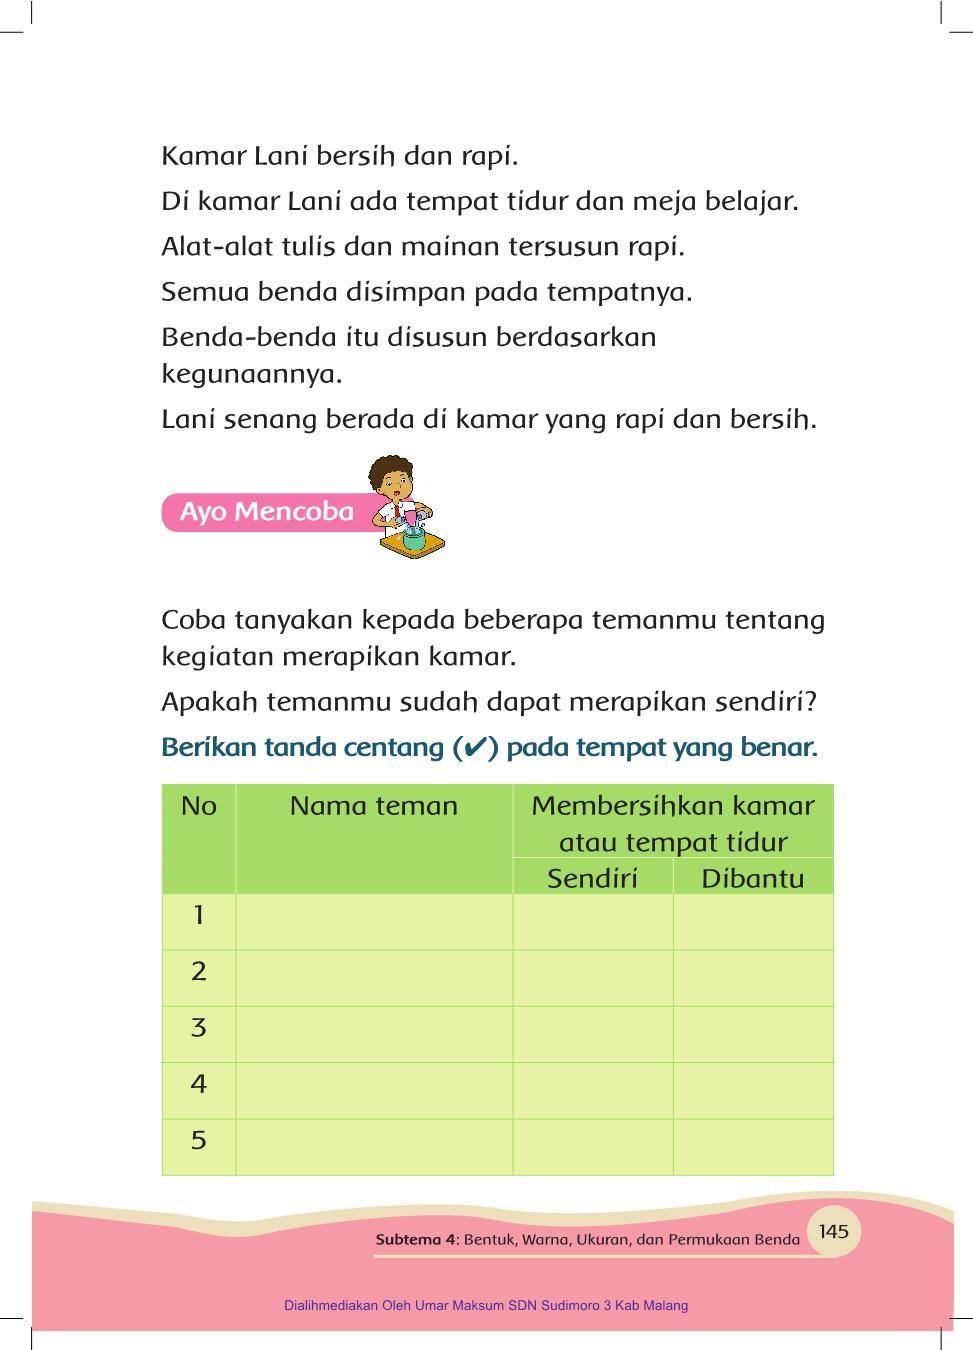 Buatlah Kalimat Untuk Membandingkan Kedua Gambar : buatlah, kalimat, untuk, membandingkan, kedua, gambar, Buatlah, Kalimat, Untuk, Membandingkan, Kedua, Gambar, IlmuSosial.id